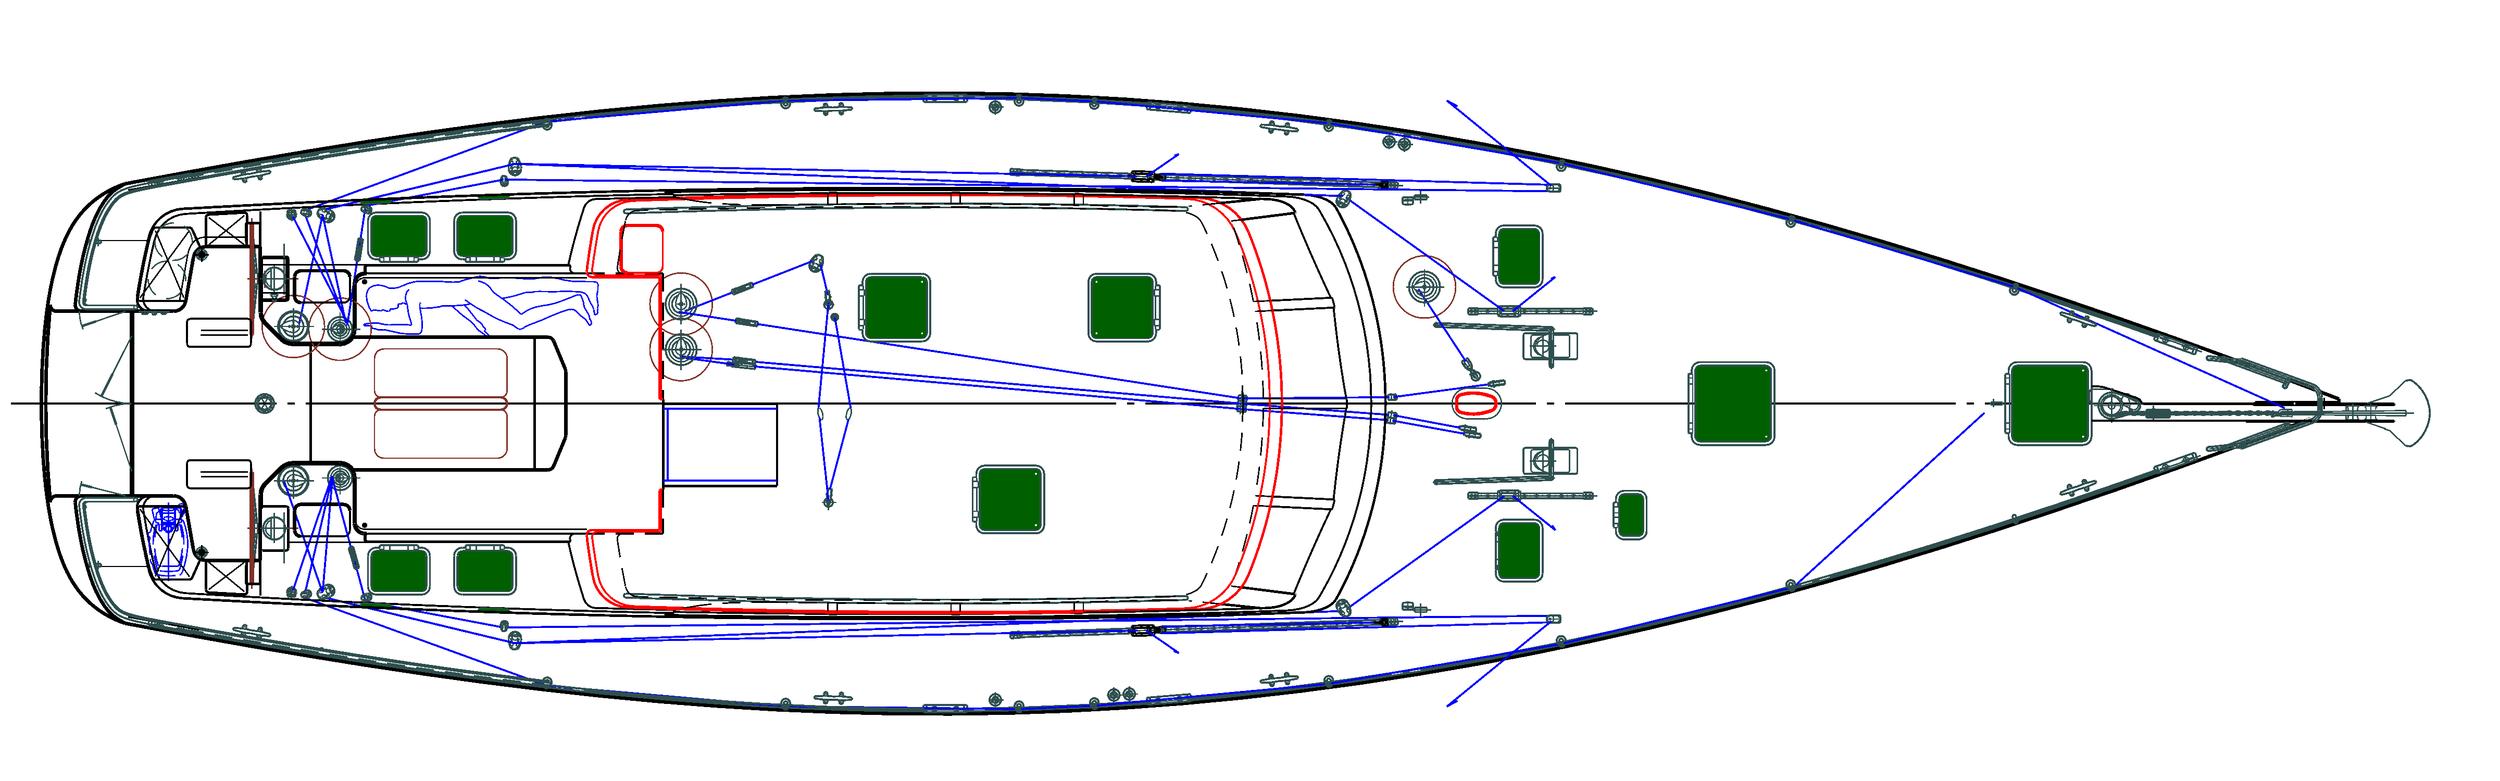 huff_60_deck_plan.png